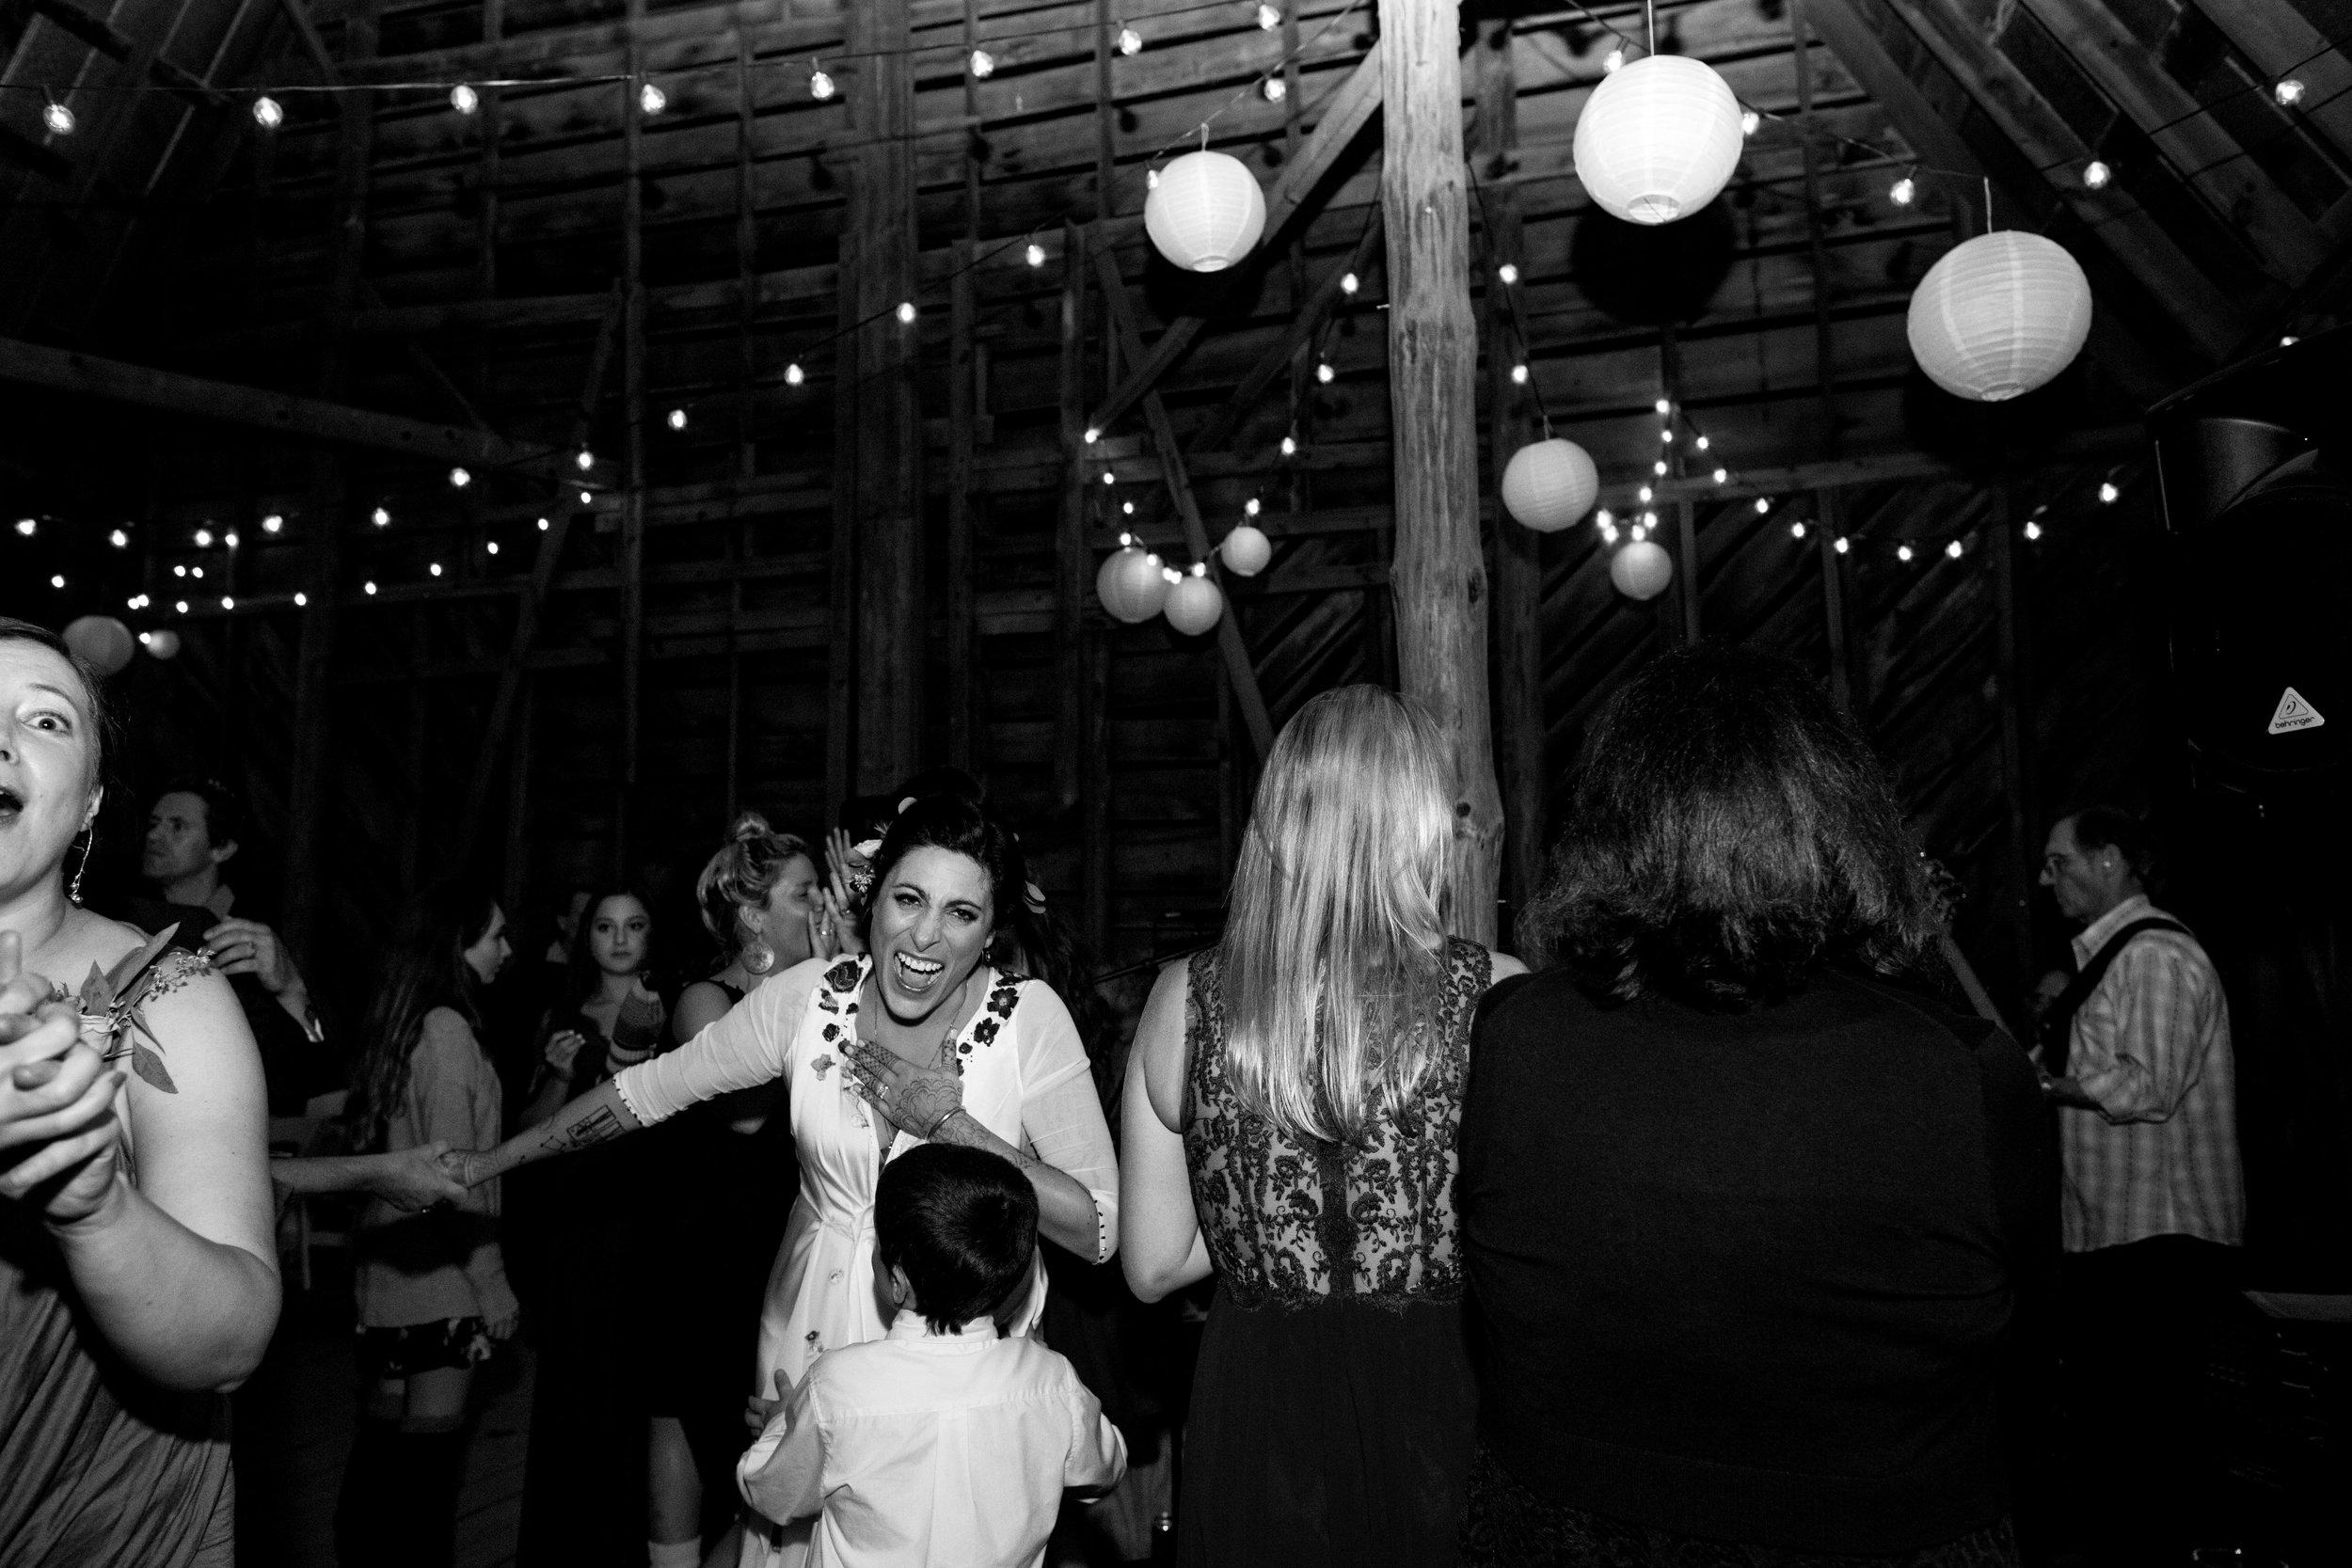 Jane Kramer + Jason Sandford Ashevegas wedding best photographer WNC -76.jpg